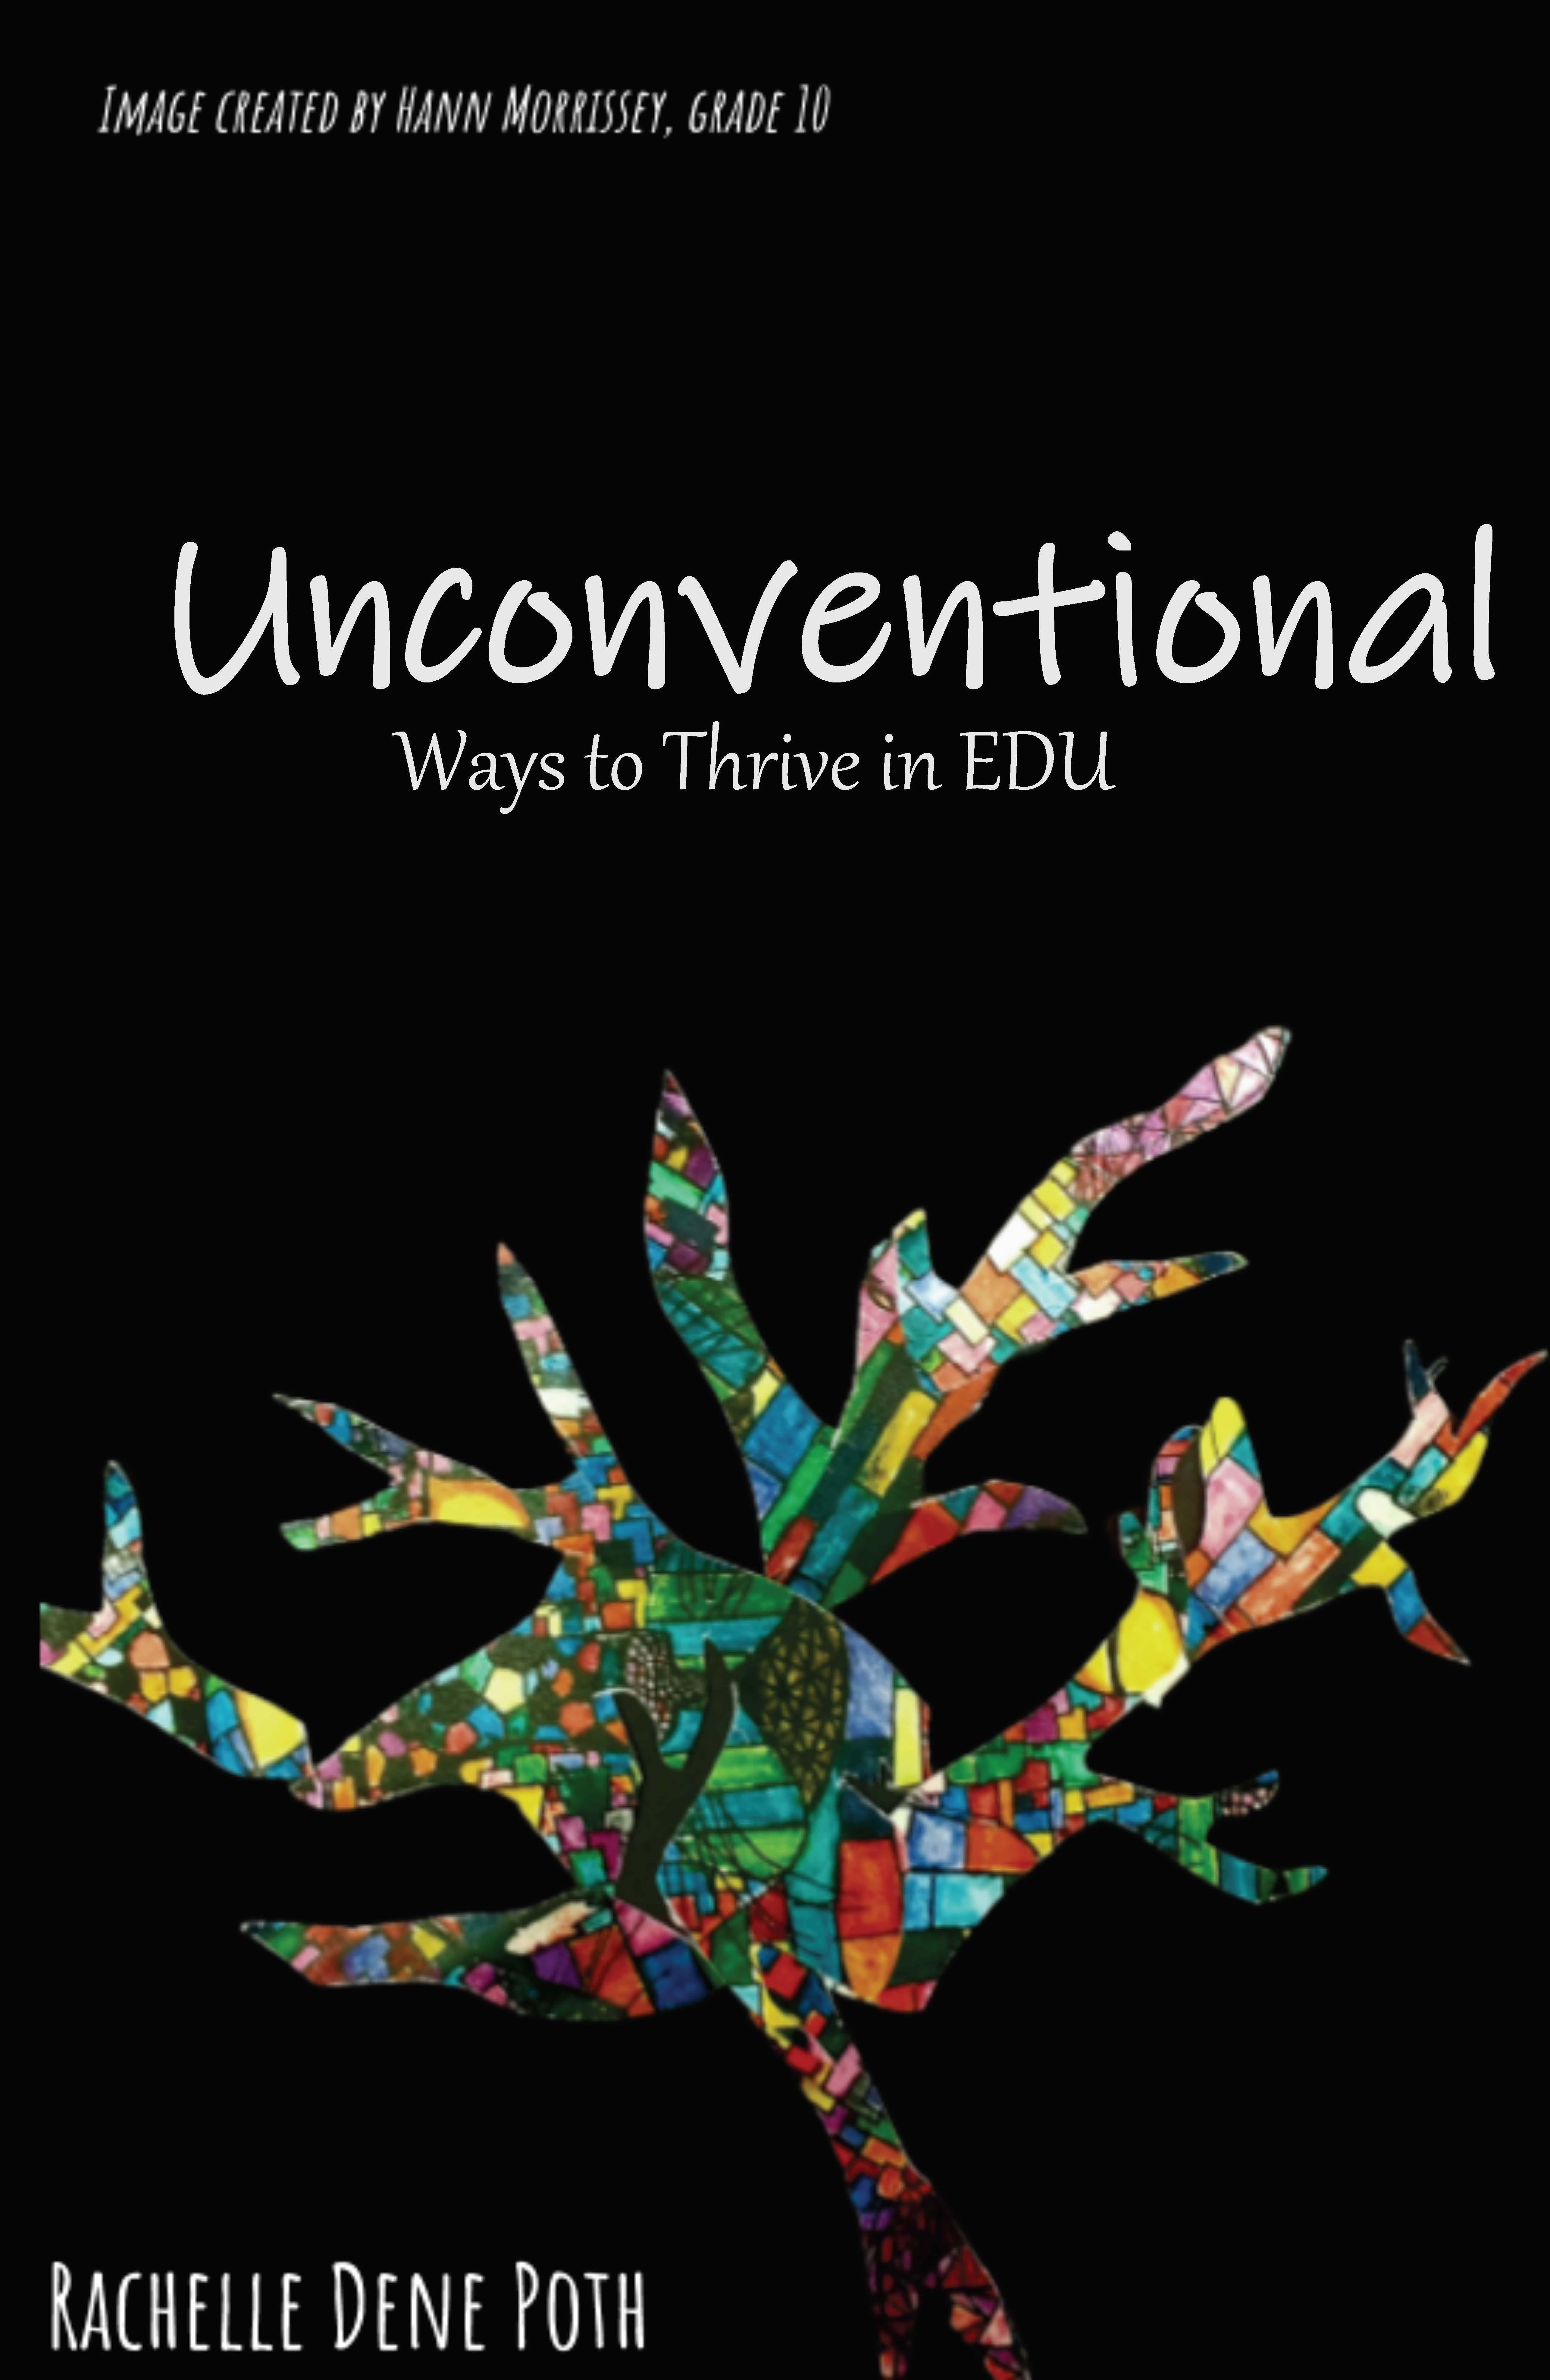 Unconventional by Rachelle Dene Poth